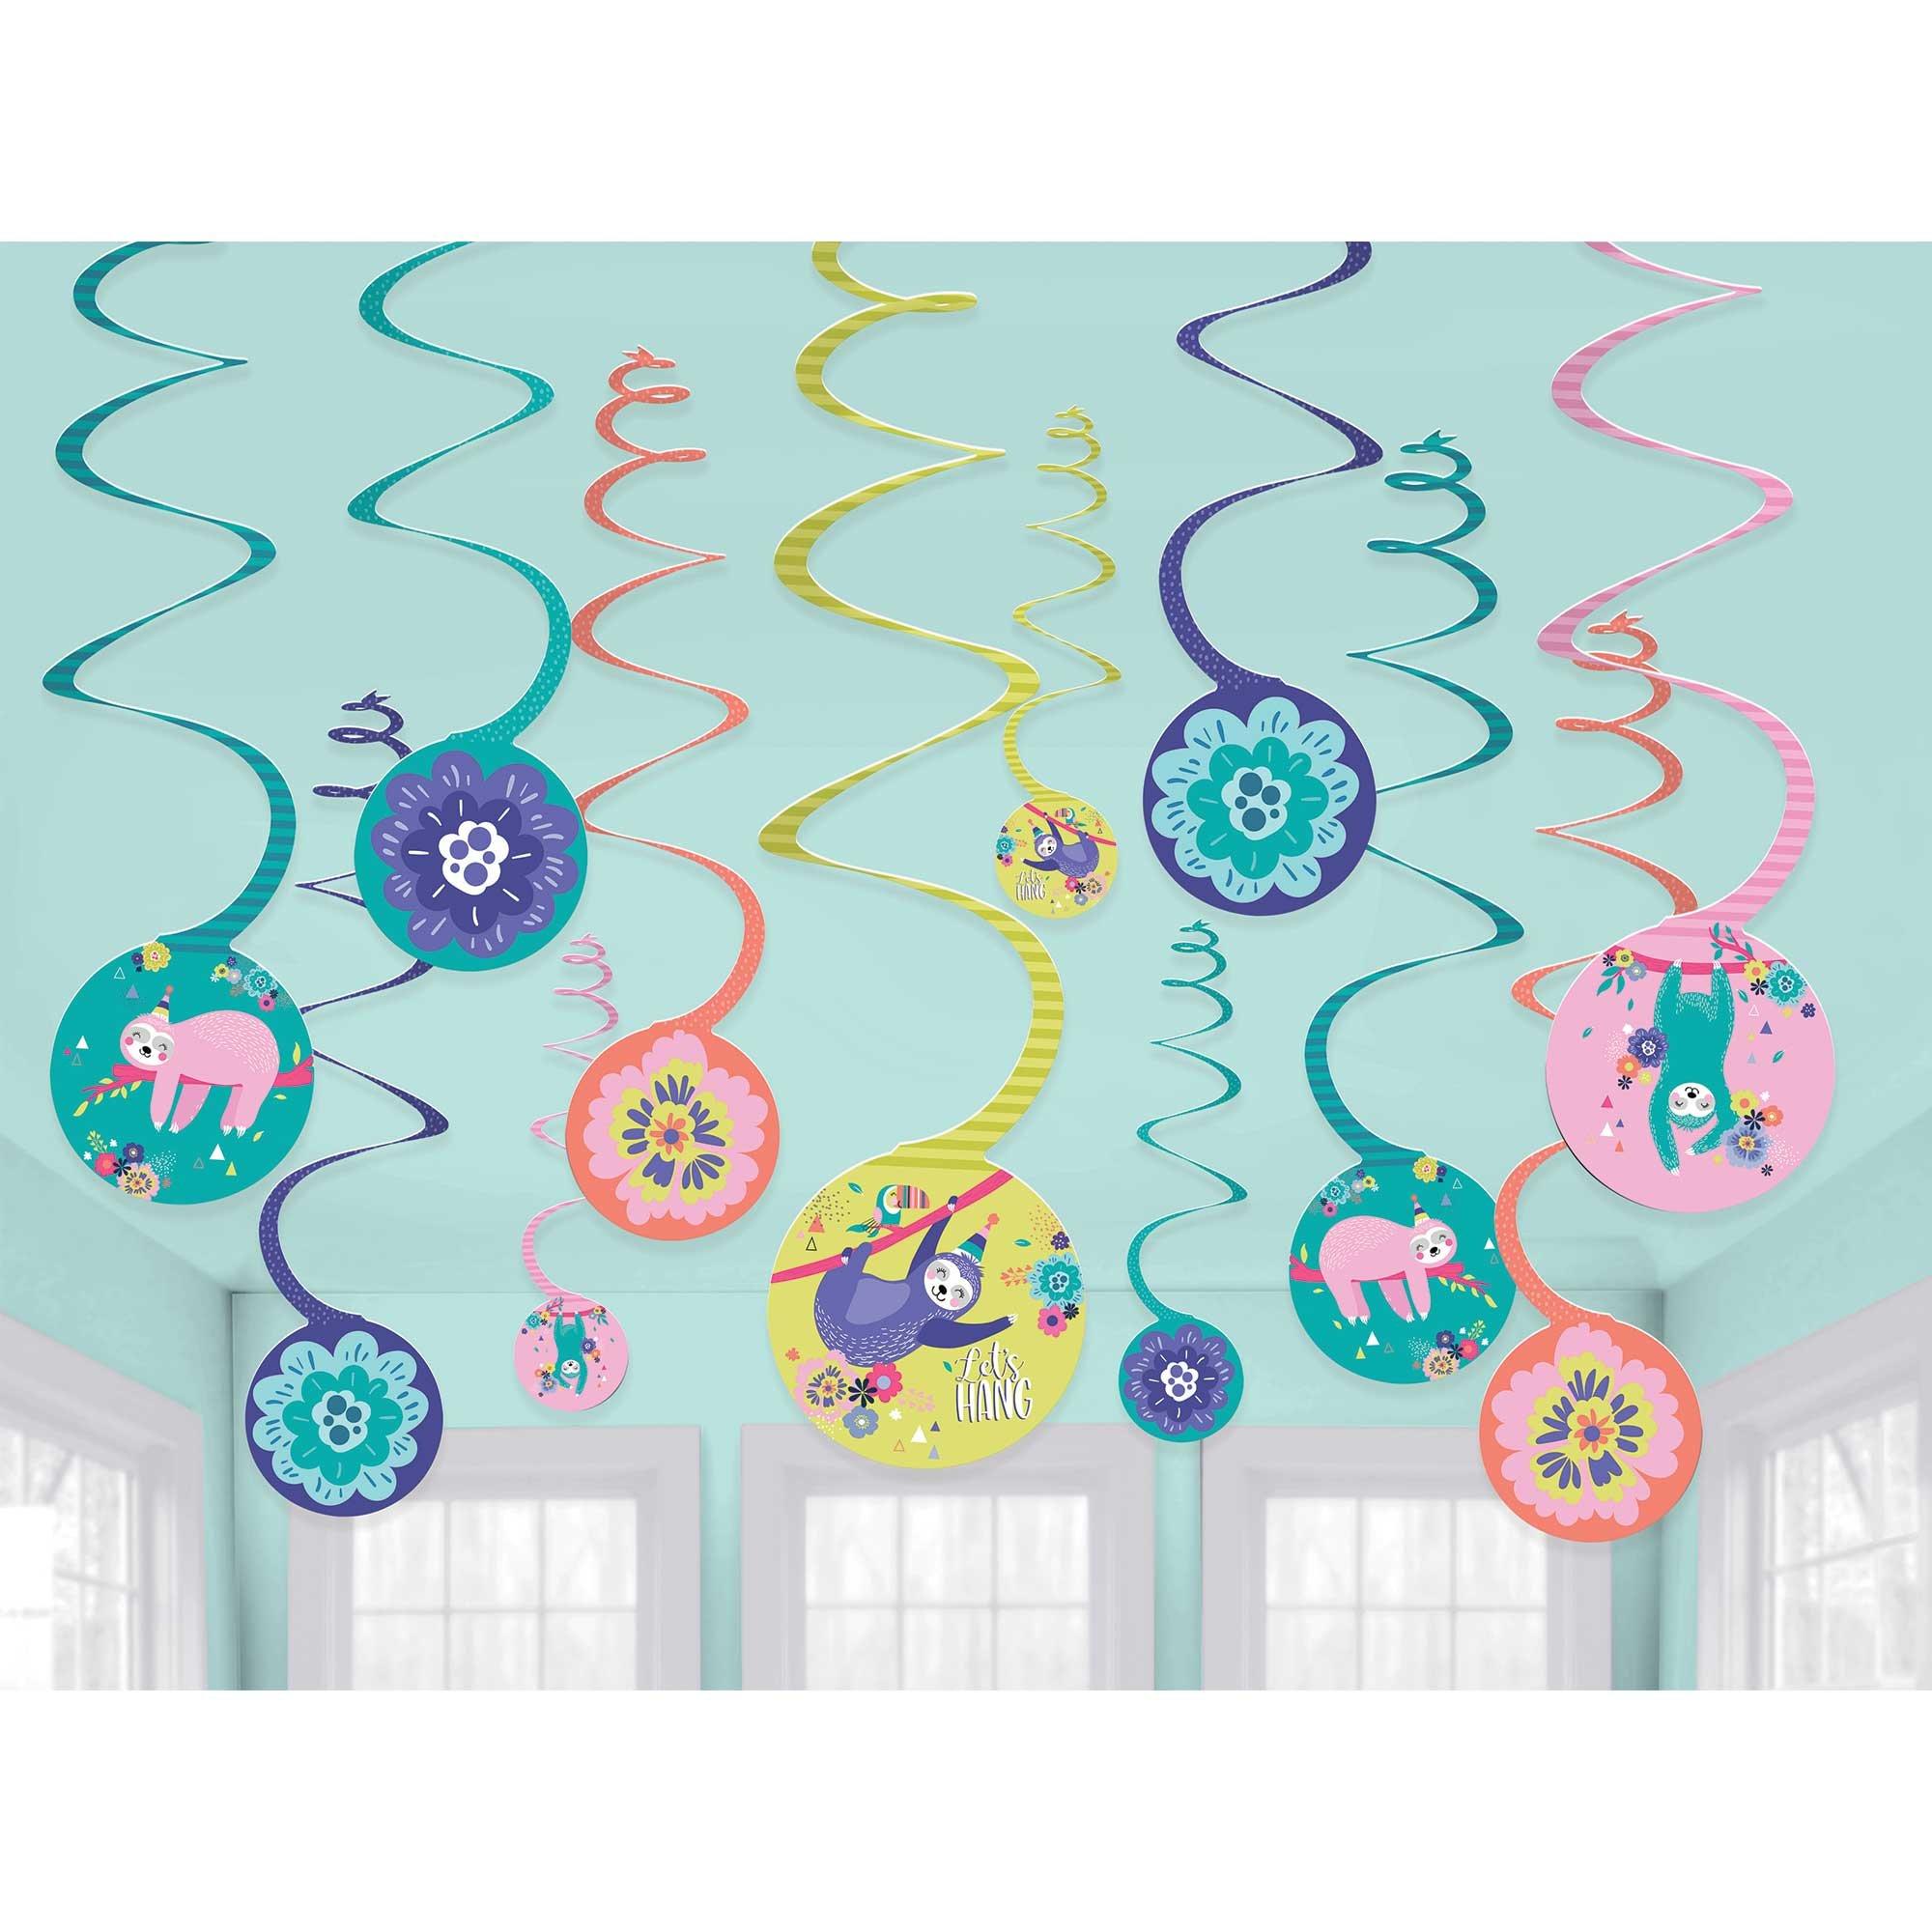 Sloth Spiral Hanging Decorations Value Pack